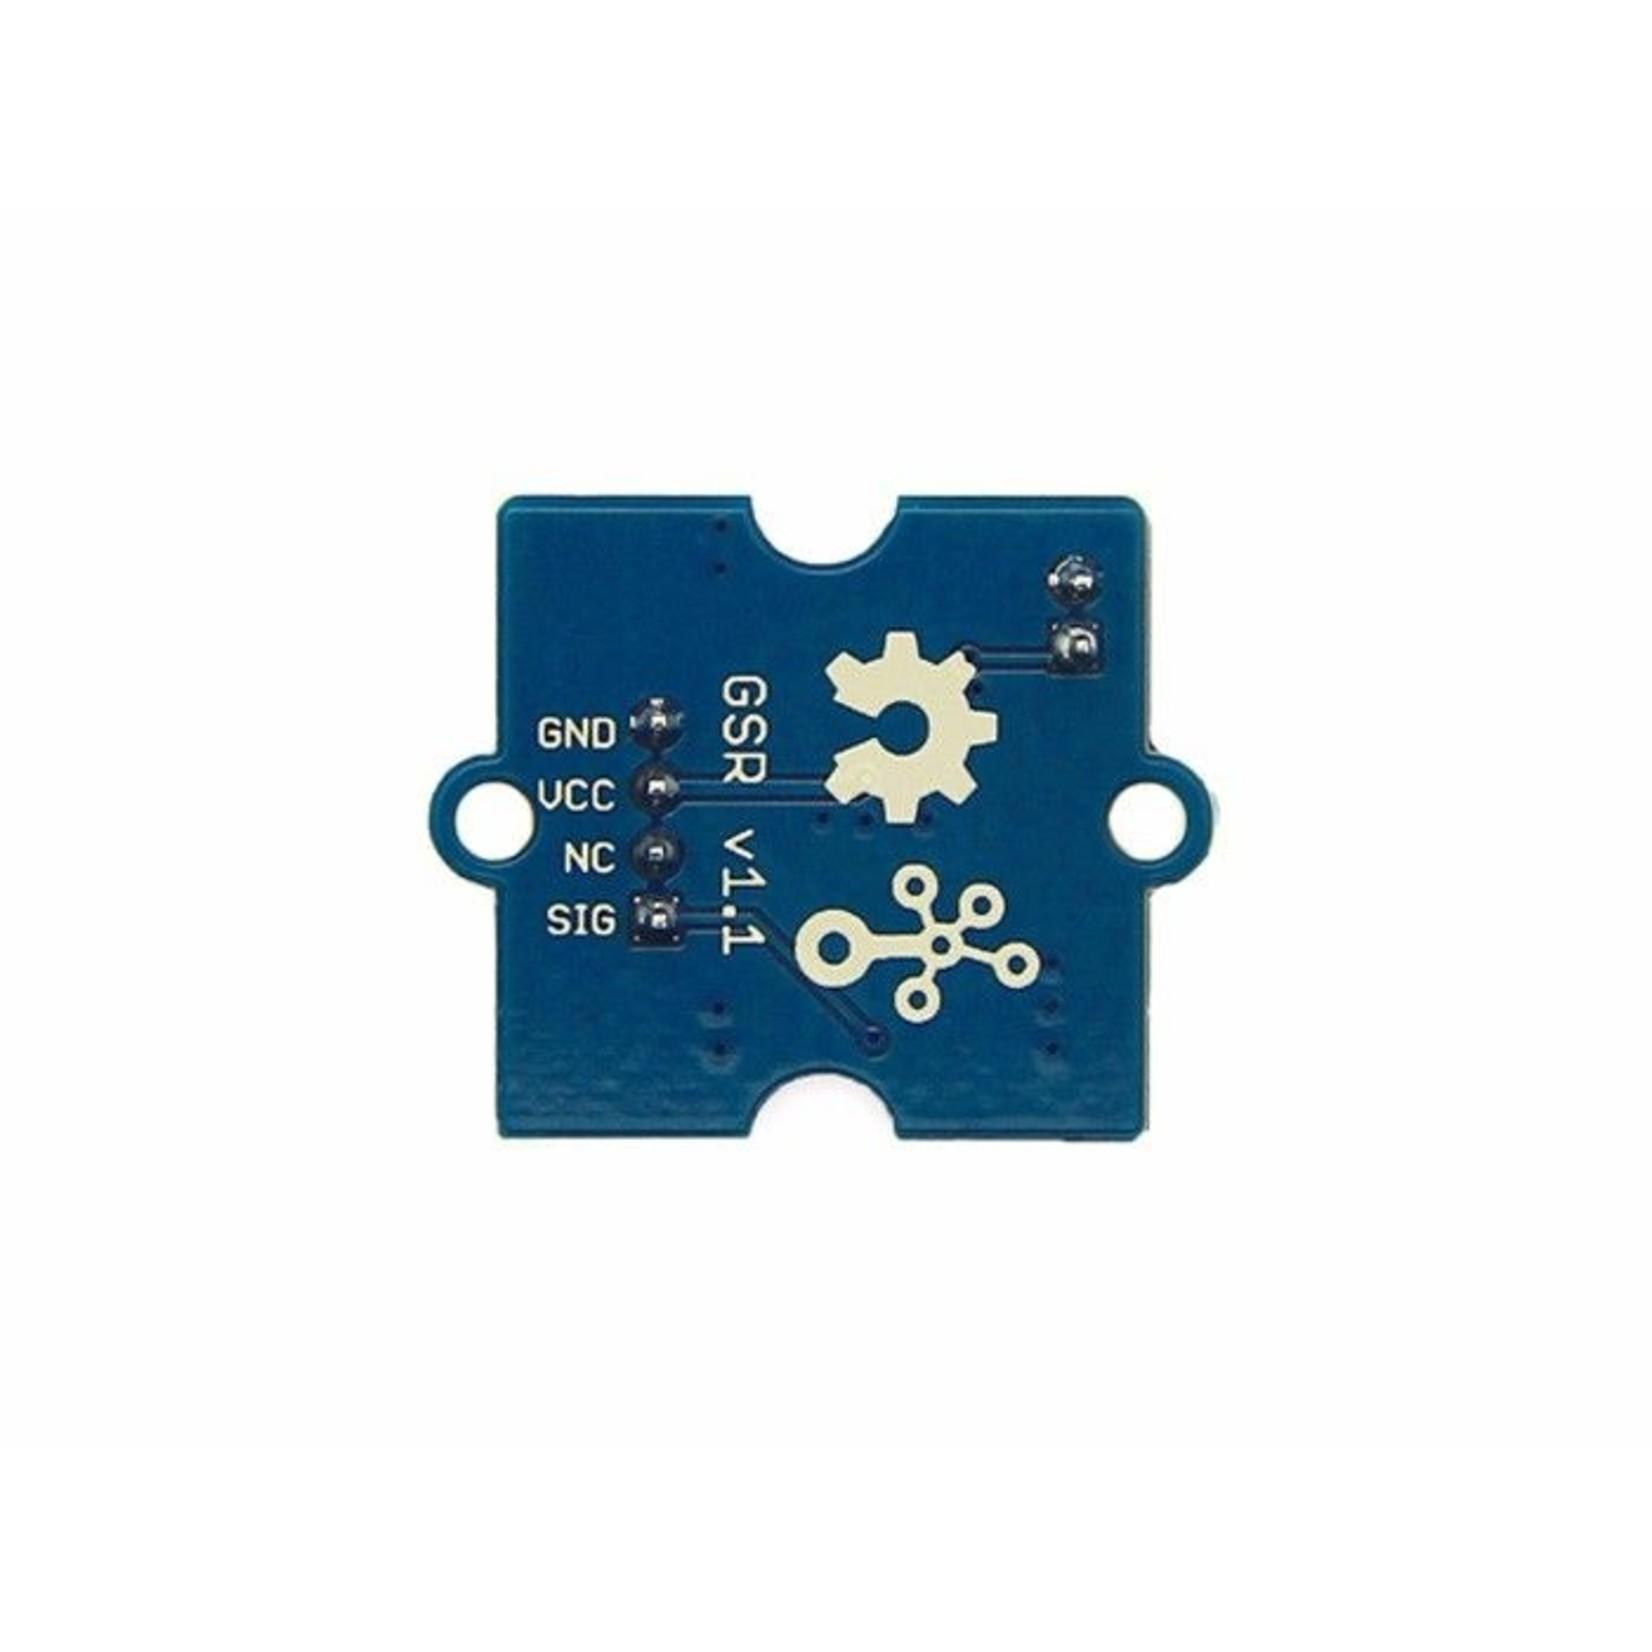 Seeed Grove - GSR sensor